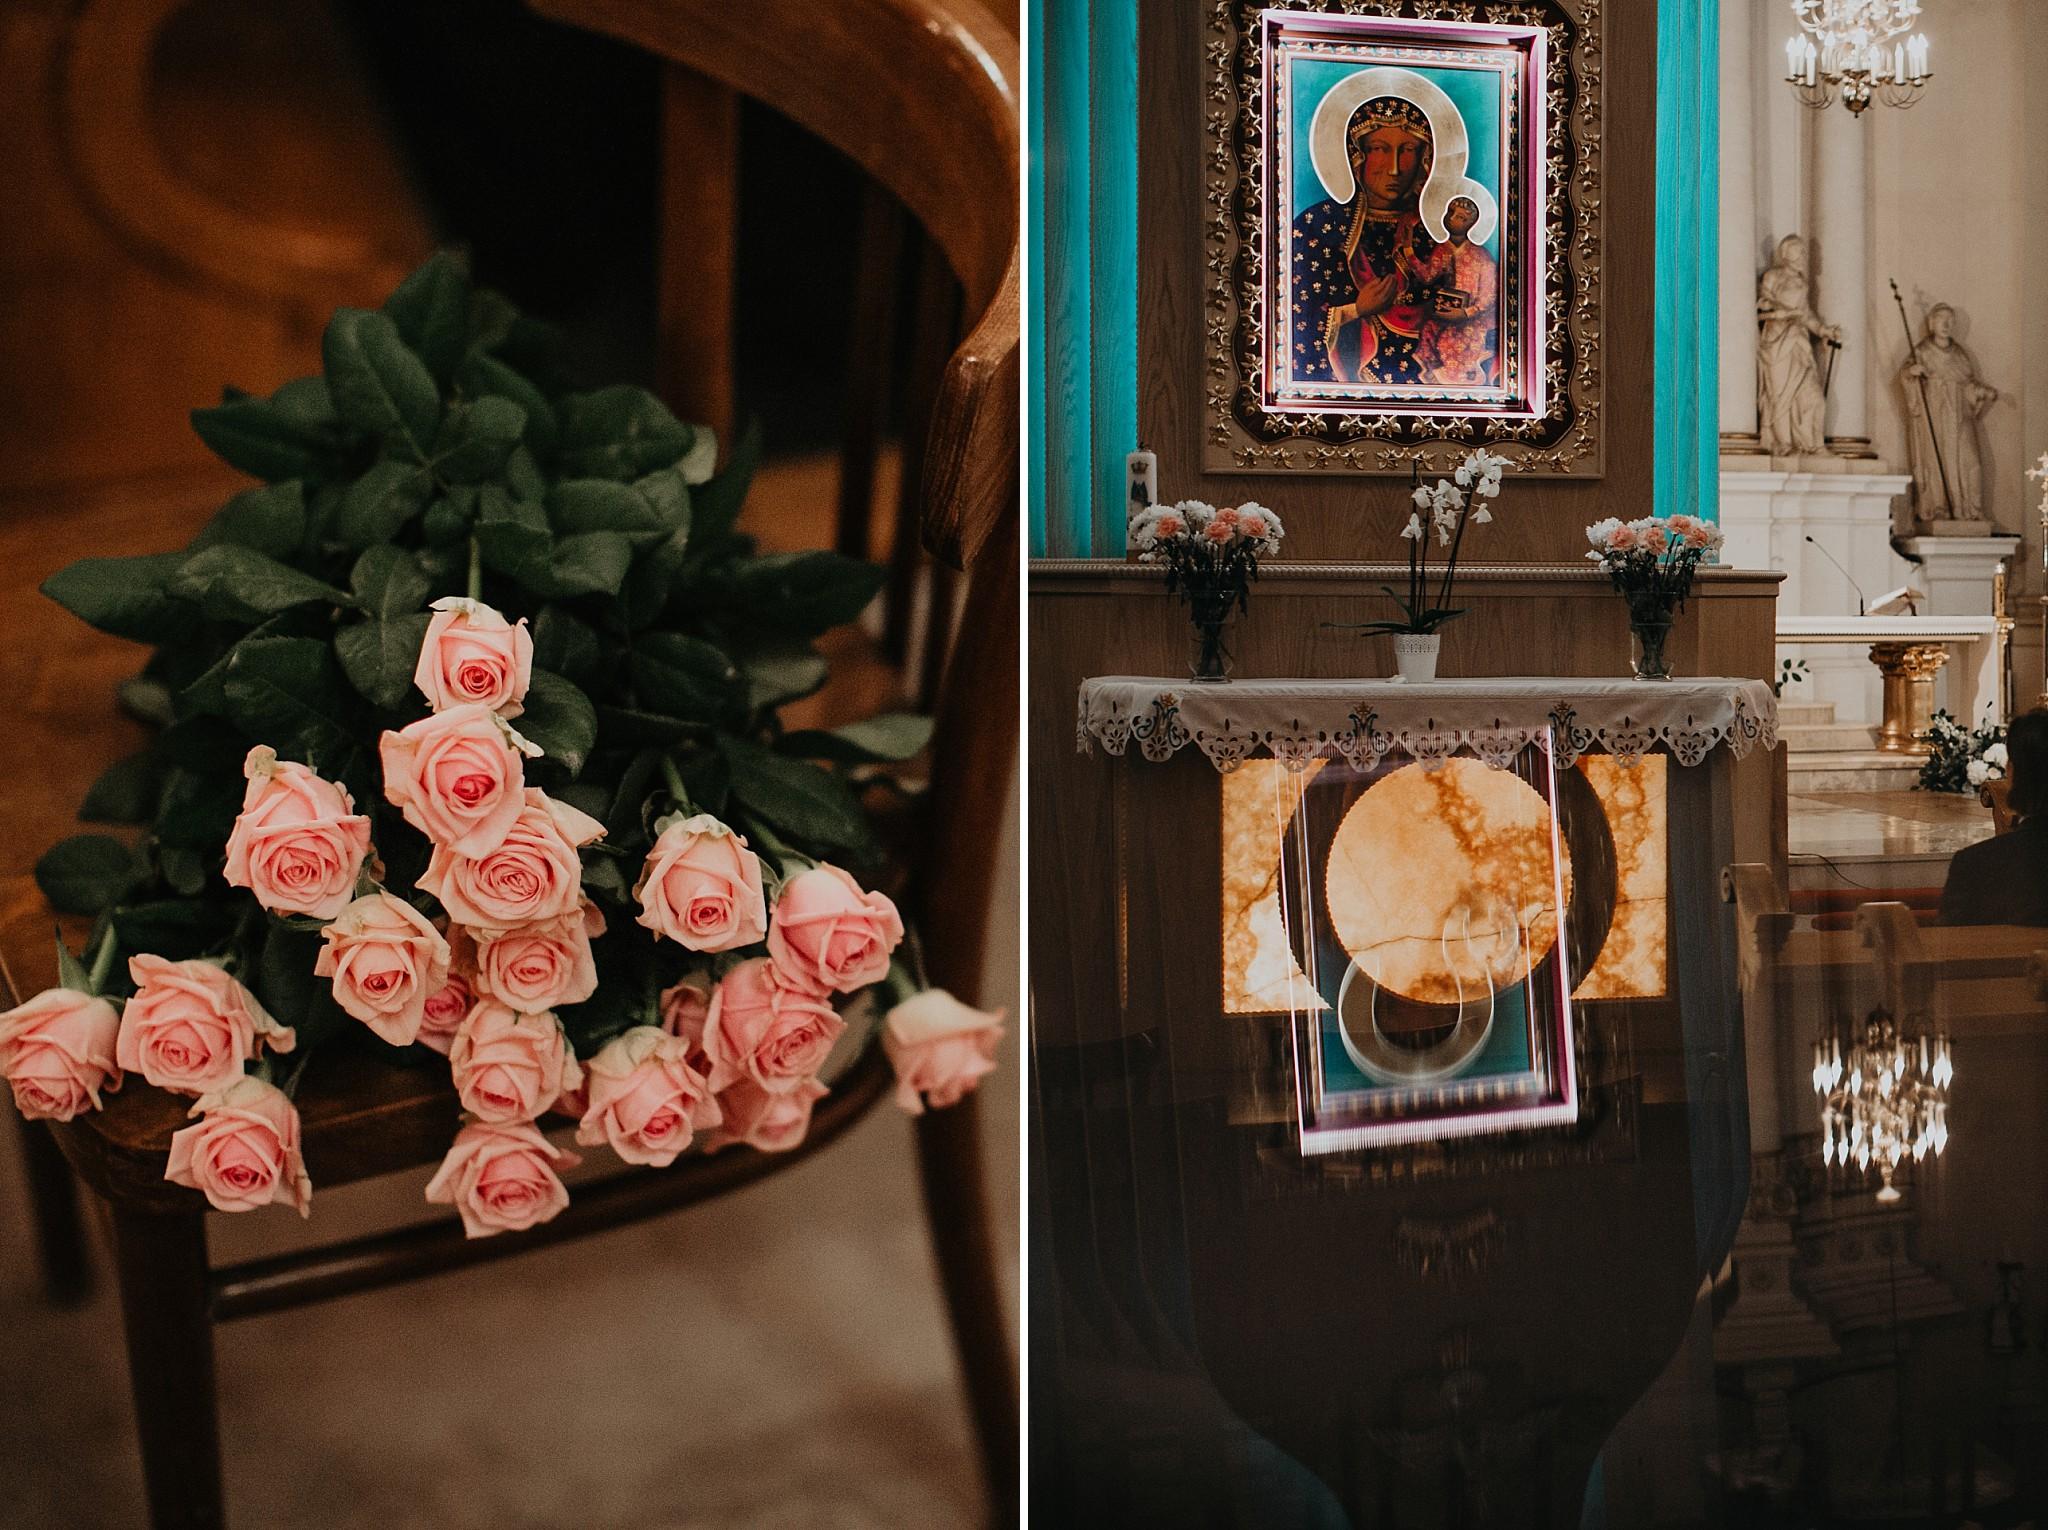 fotograf poznan wesele dobra truskawka piekne wesele pod poznaniem wesele w dobrej truskawce piekna para mloda slub marzen slub koronawirus slub listopad wesele koronawirus 161